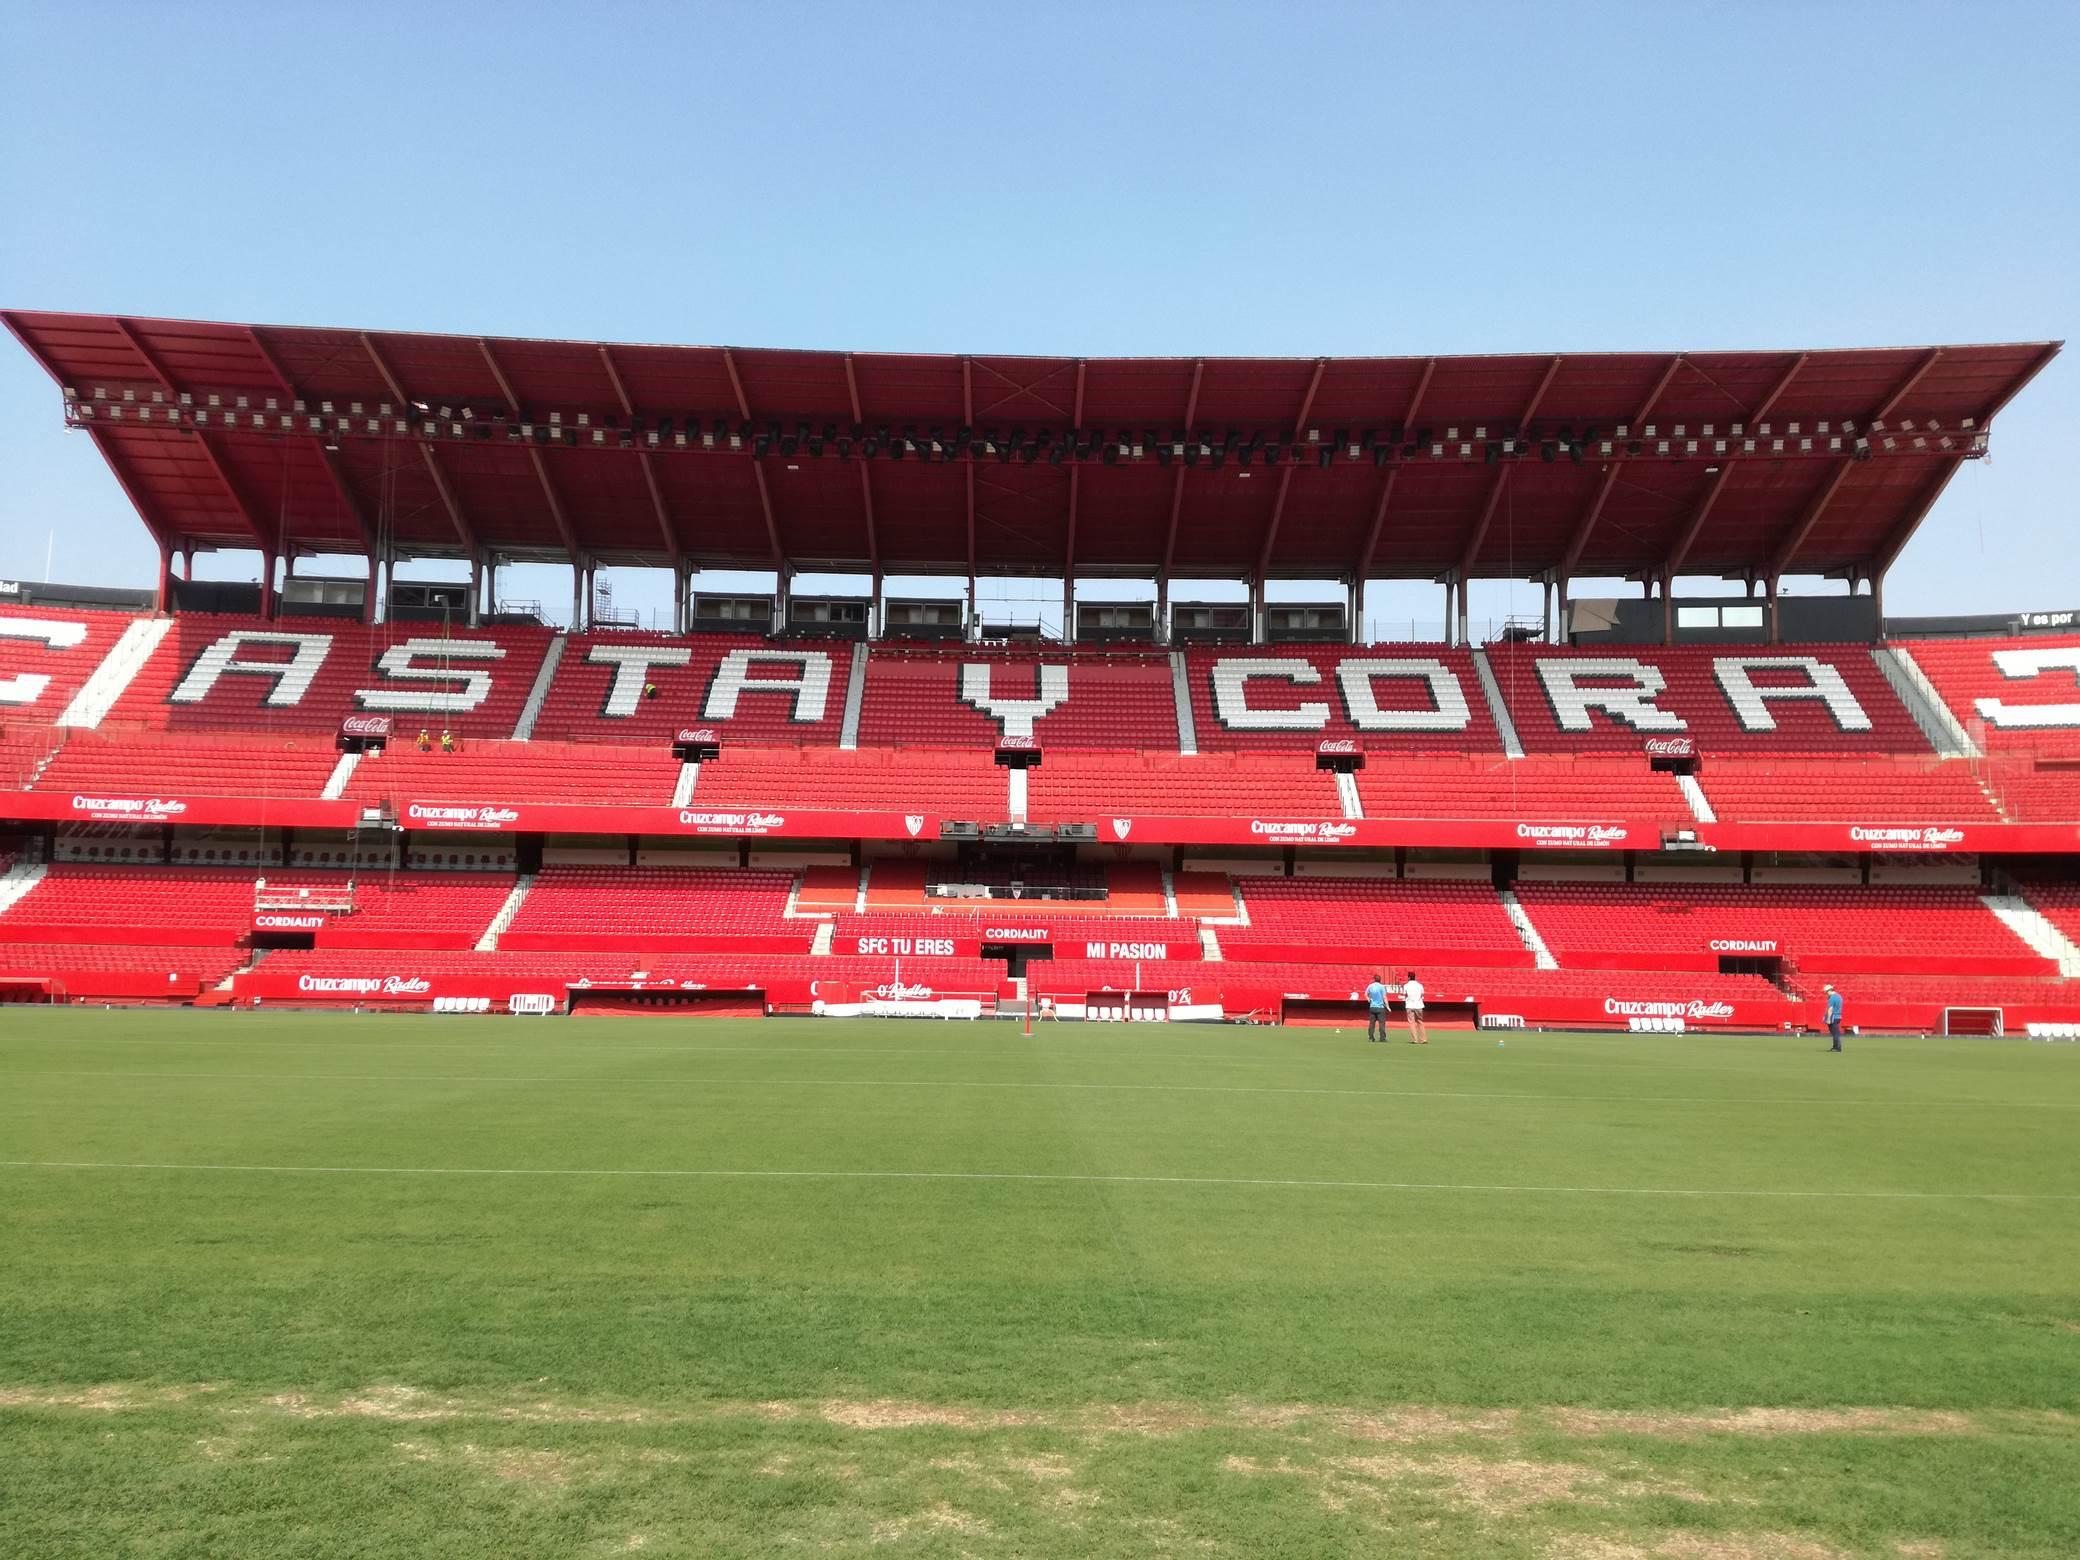 Estadio Ramón Sánchez-Pizjuán (Sevilla FC), Sevilla